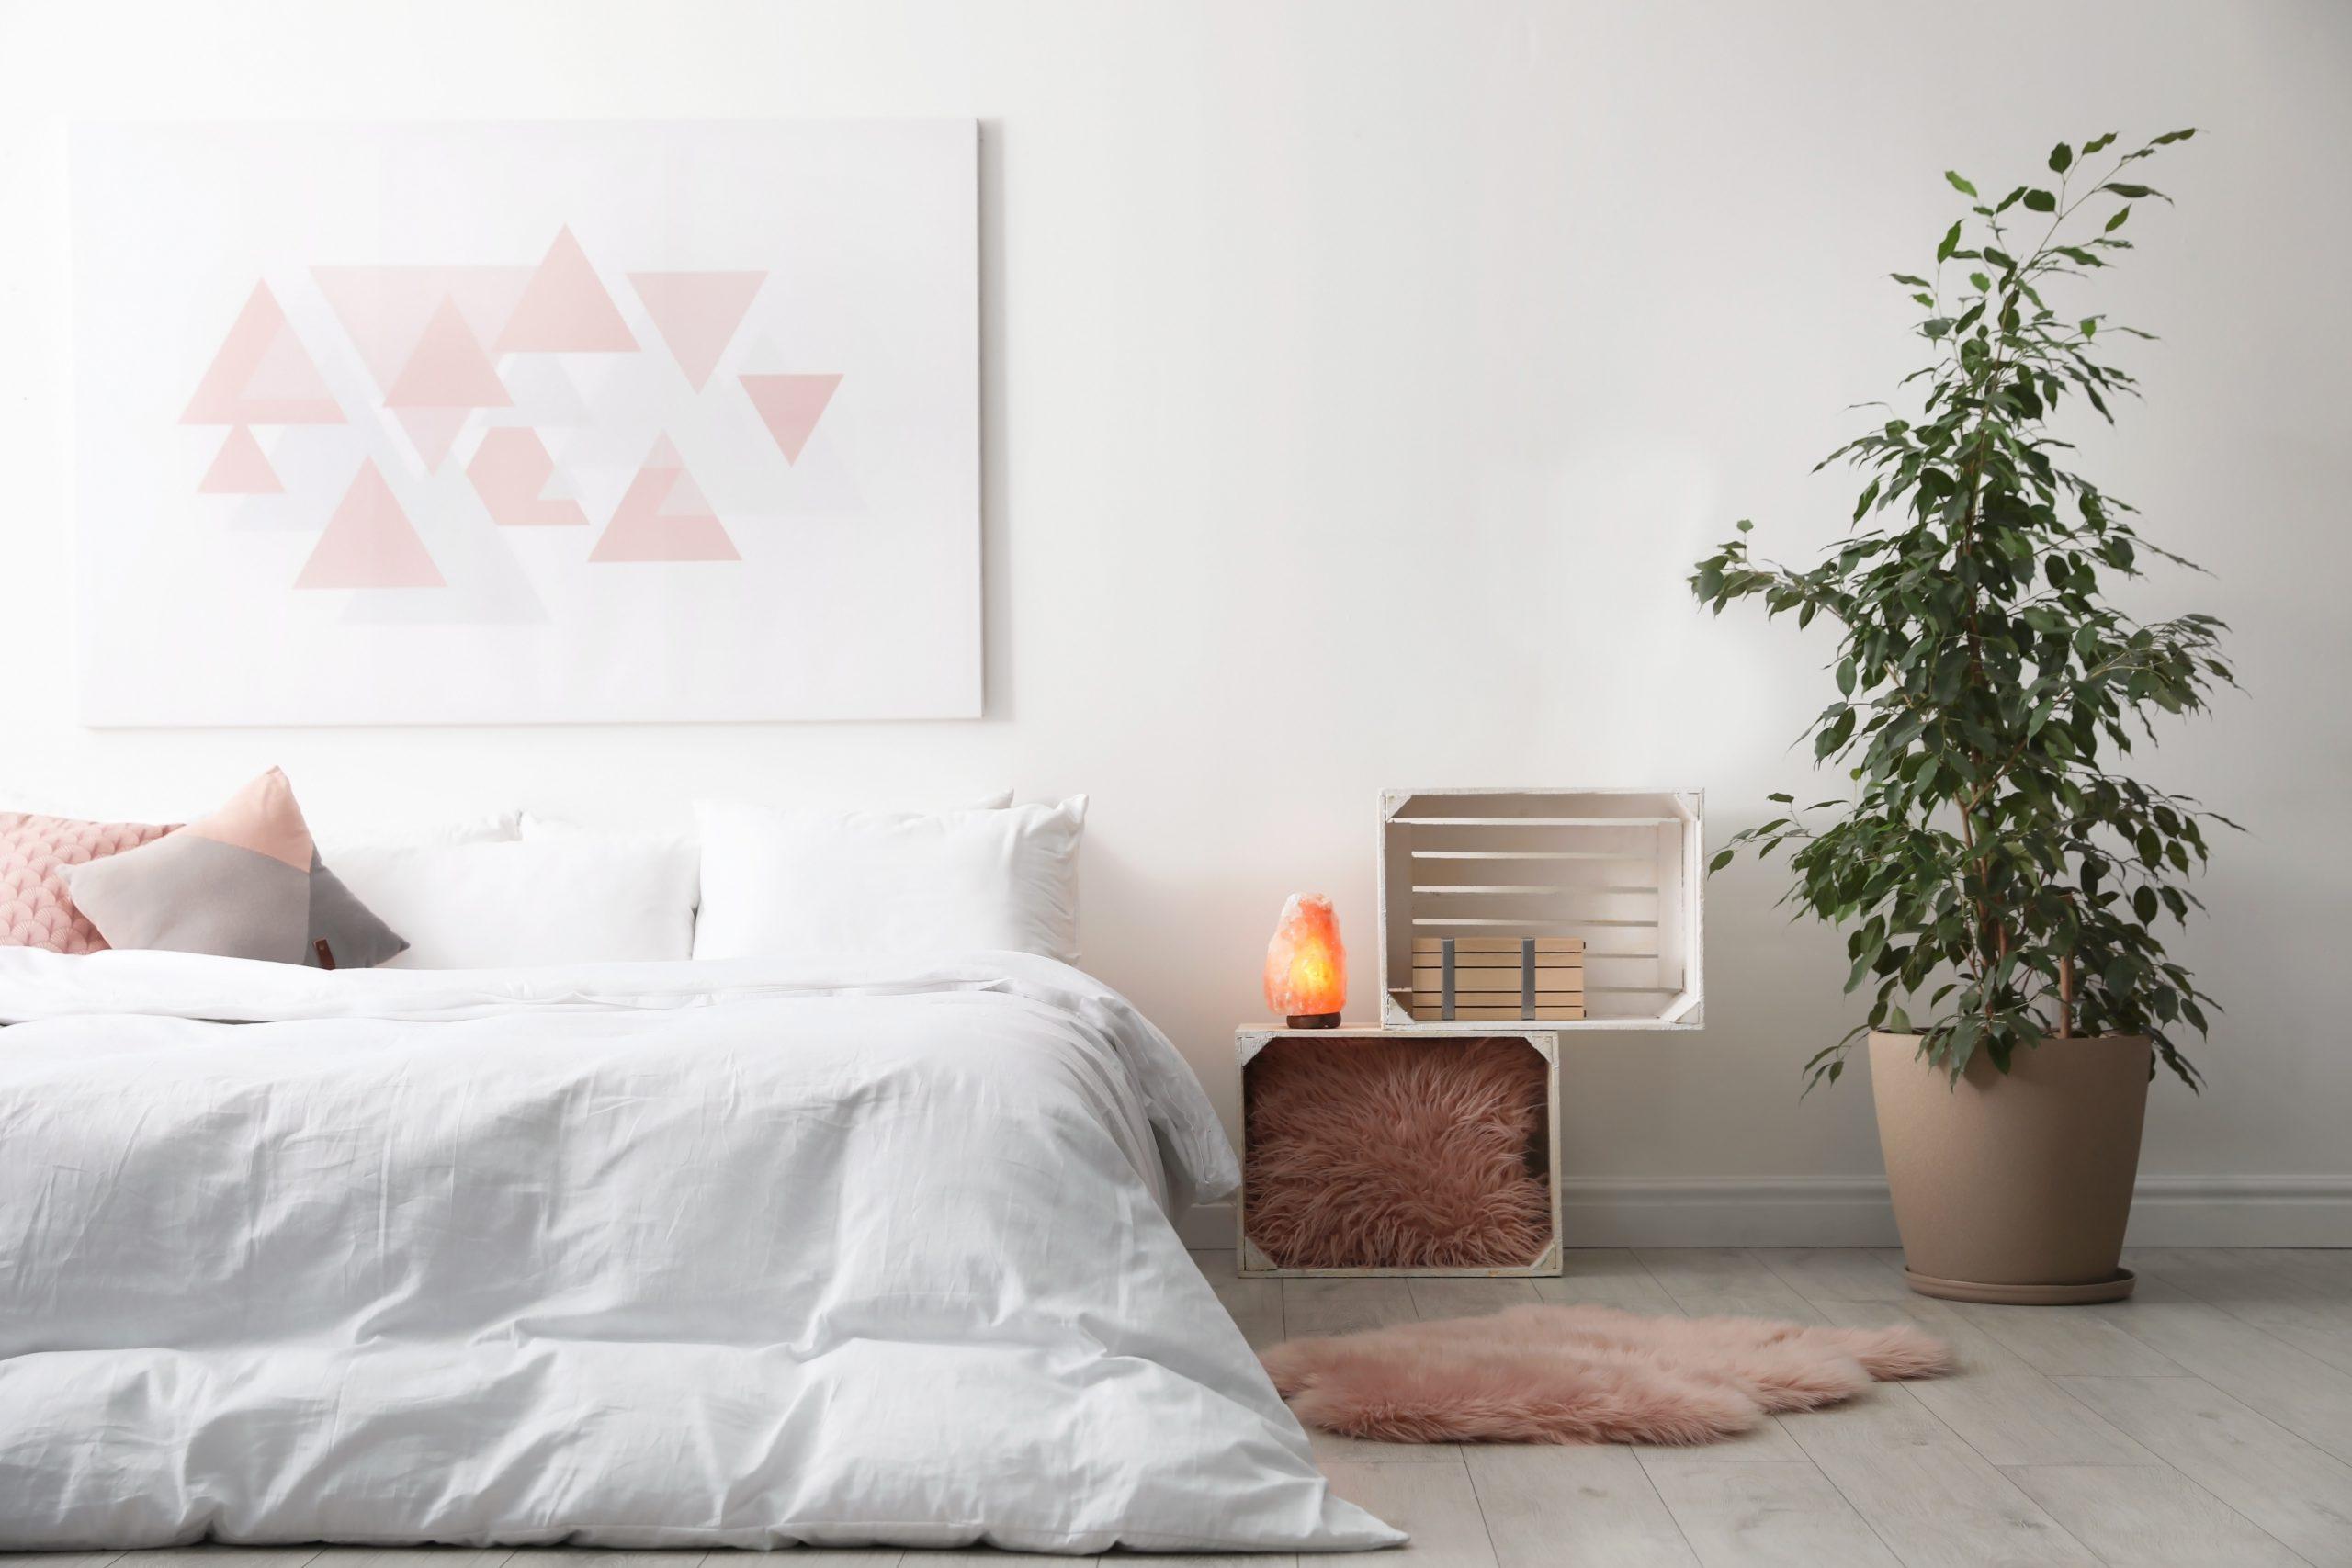 fabricantes de sábanas de hotel